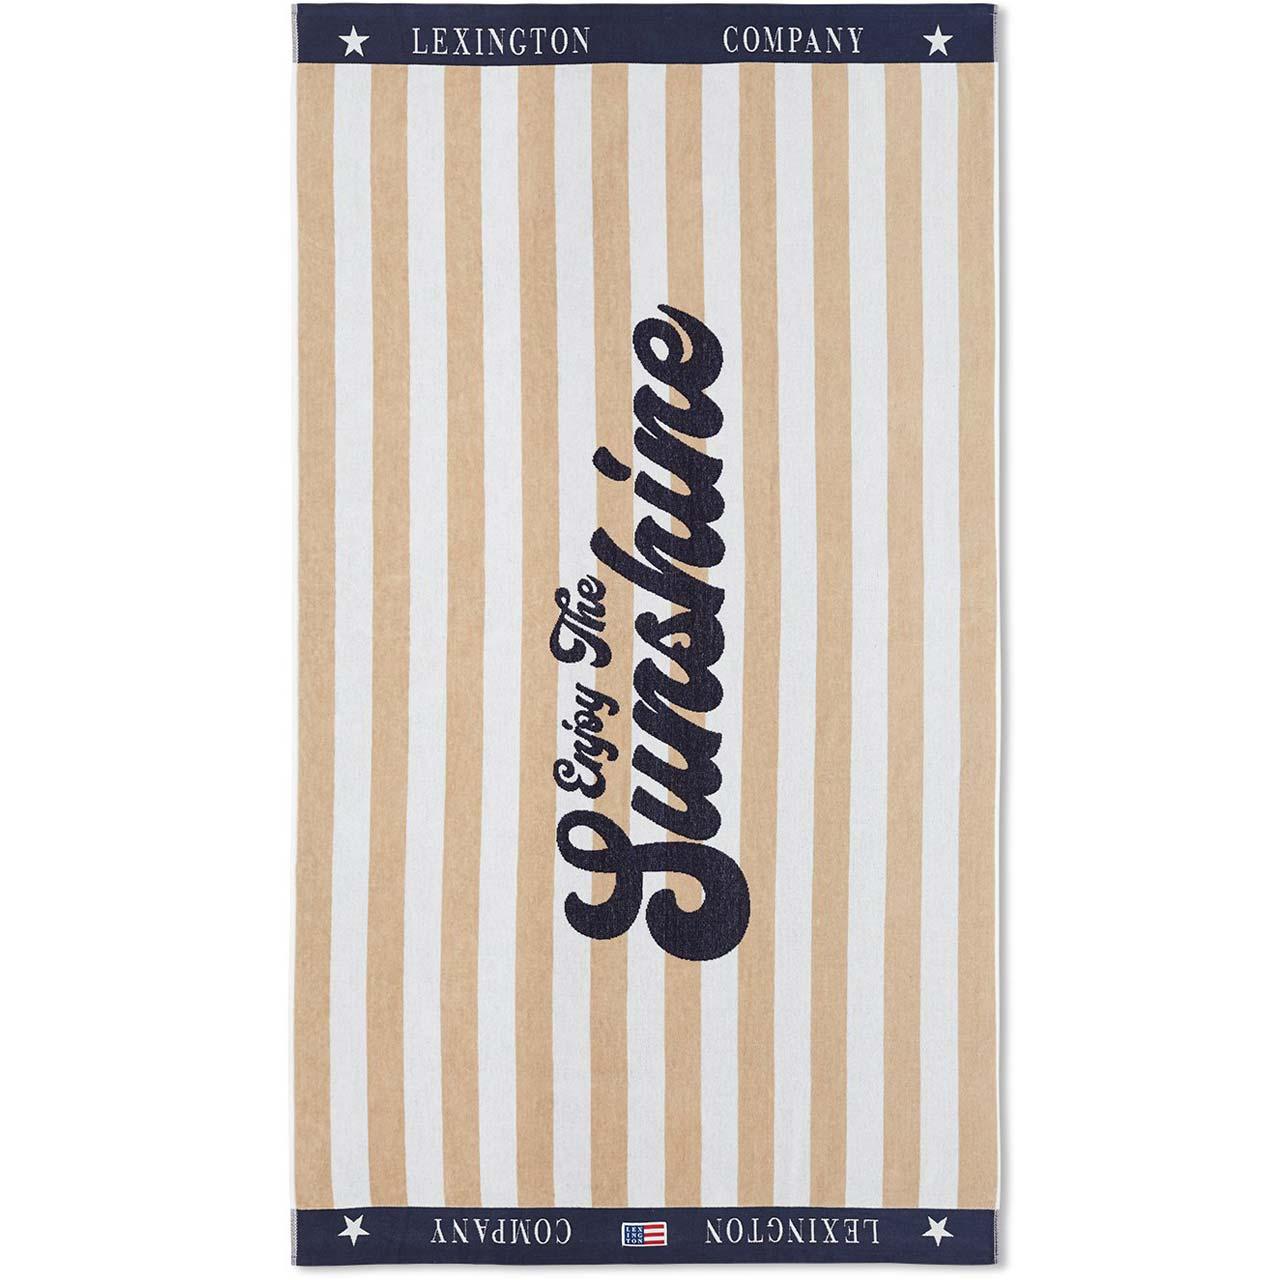 "LEXINGTON COMPANY -  Strandtuch ""Graphic Cotton Velour"""